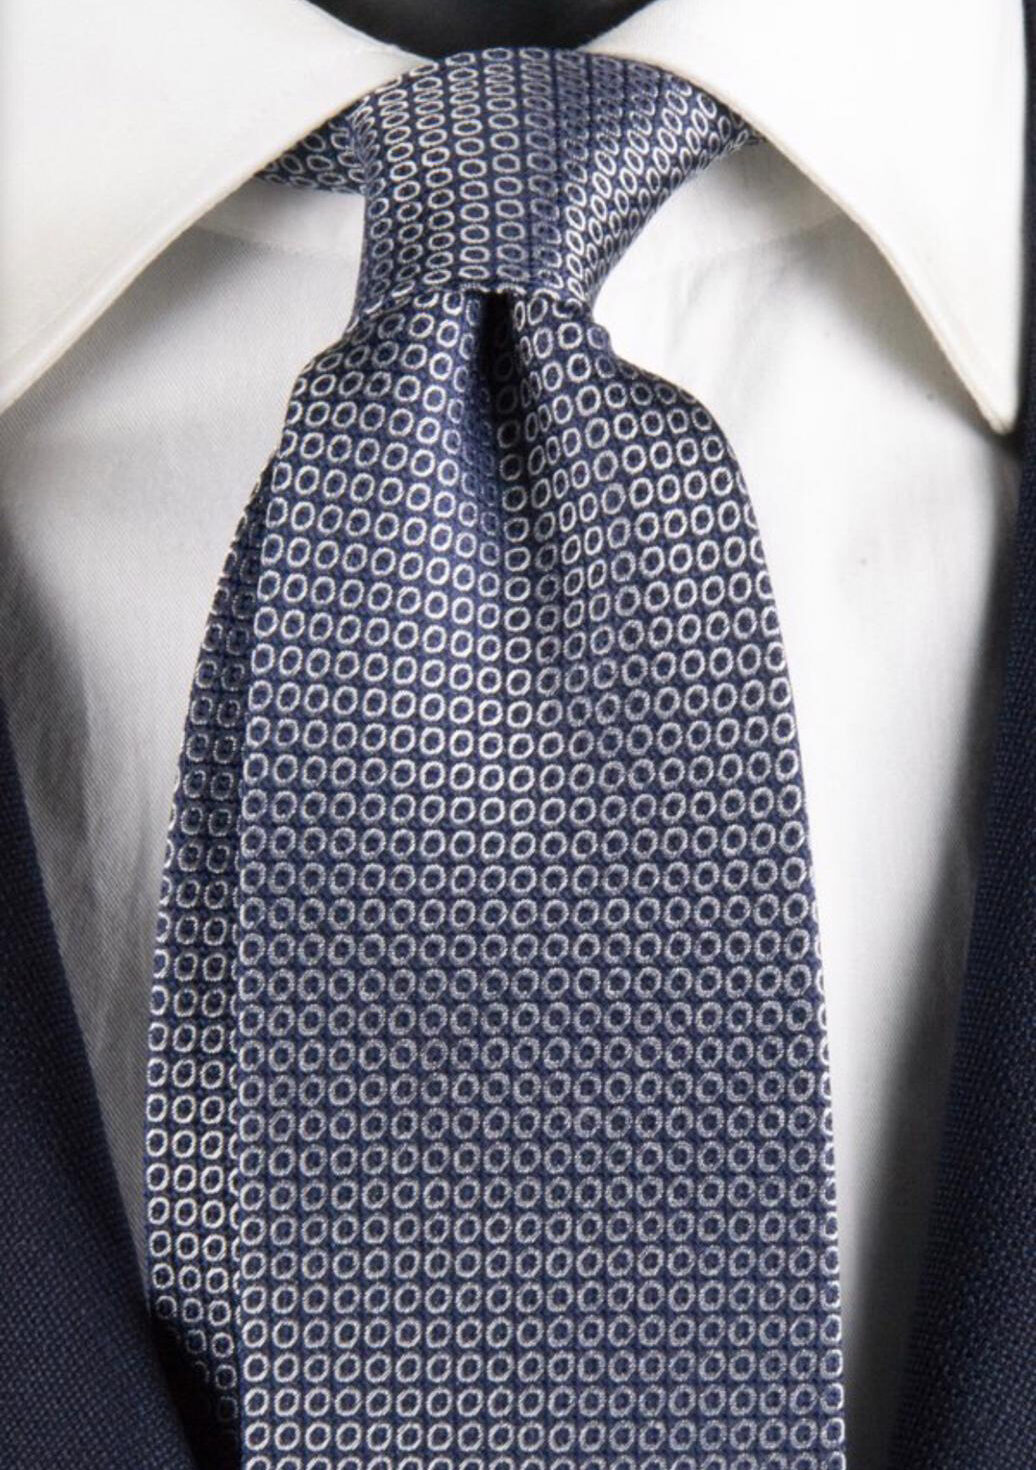 Cravatta Graffeo Cravatte Buzzitta Stile